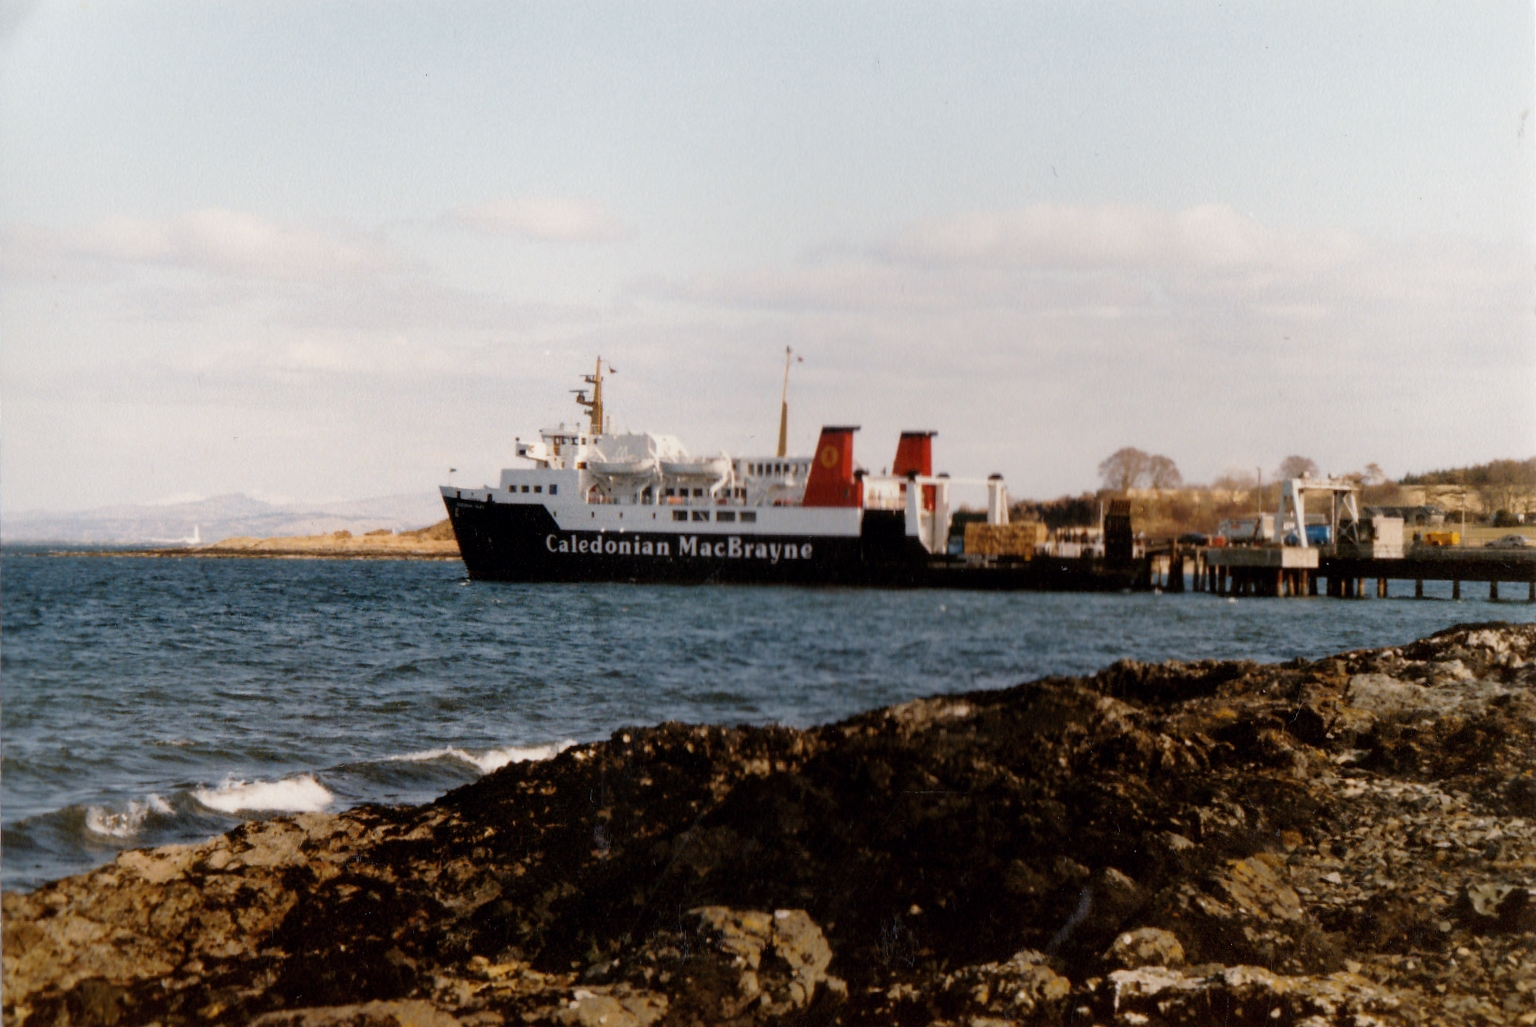 Hebridean Isles at Craignure (Jim Aikman Smith)